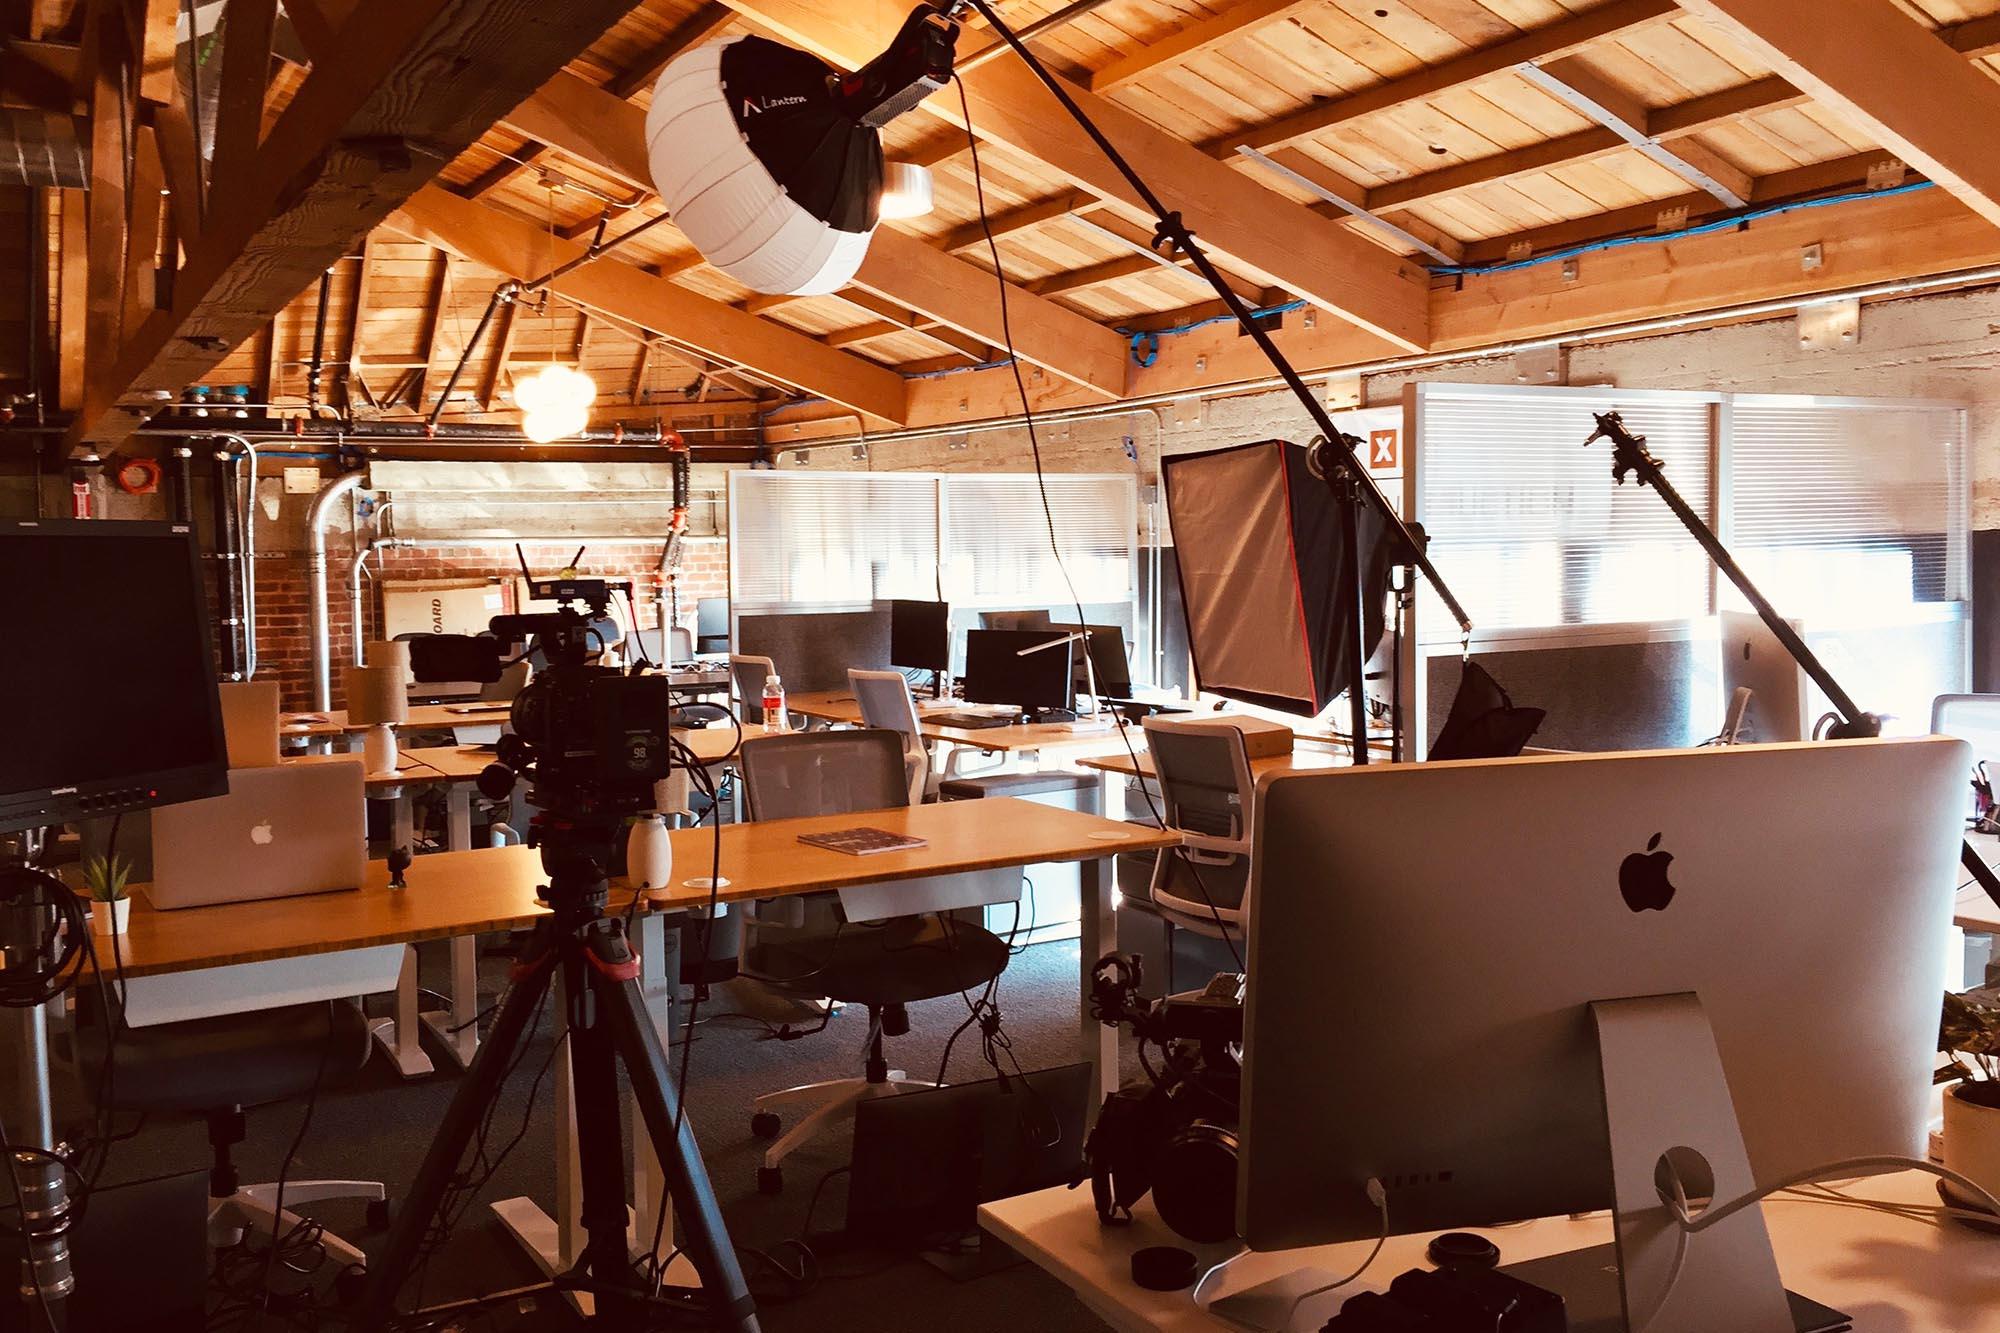 Film shoot production